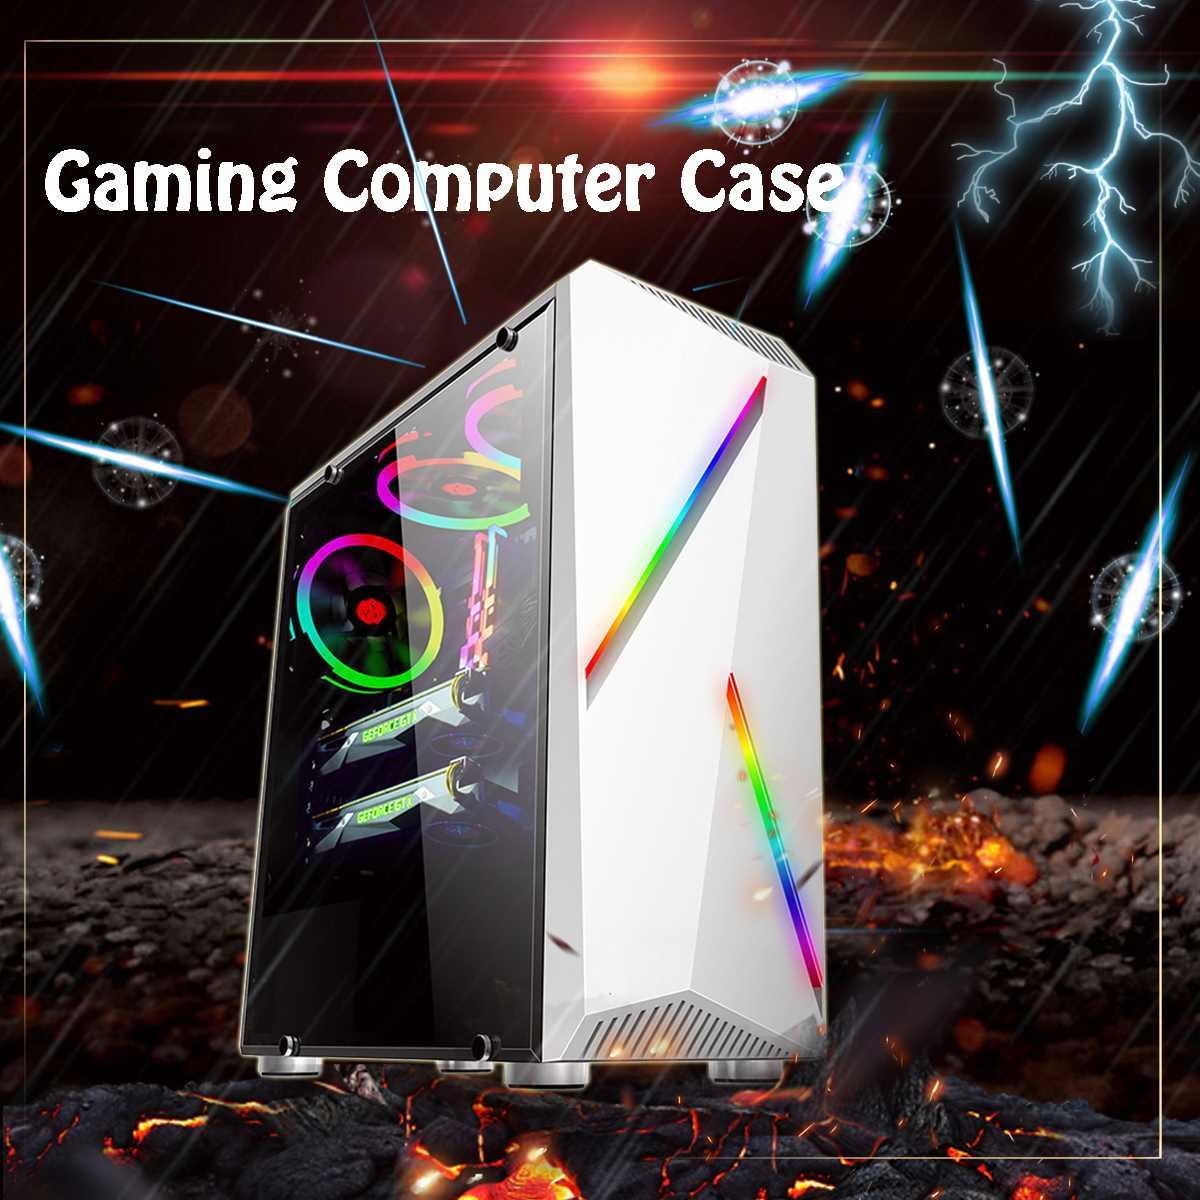 LEORY Transparente Computer PC Fall Gaming ATX Audio mit 2 RGB Farbwechsel Licht Streifen 350X170X420mm